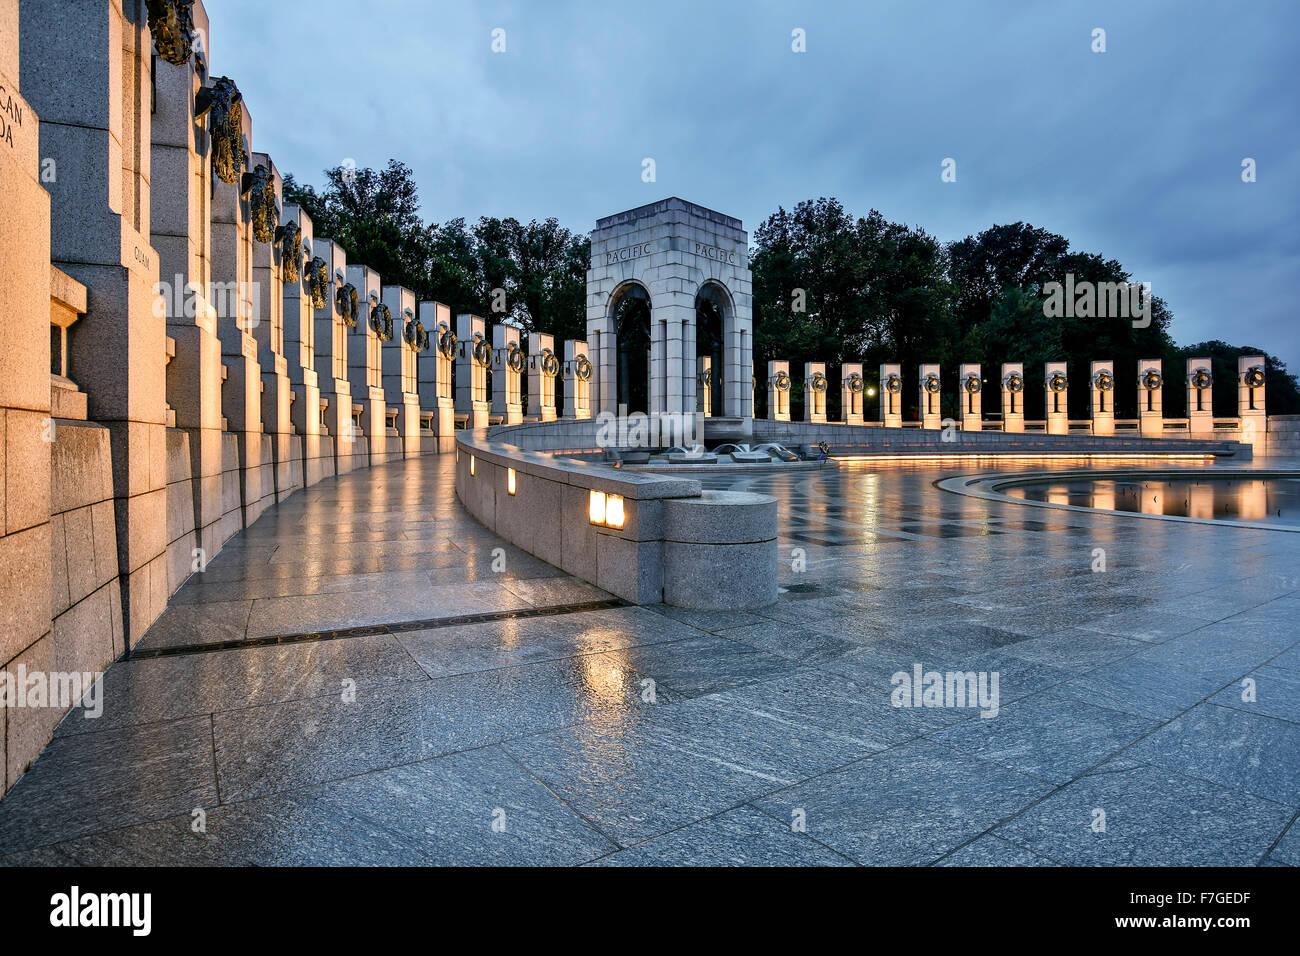 World War II Memorial, Washington, District Of Columbia USA Stockbild